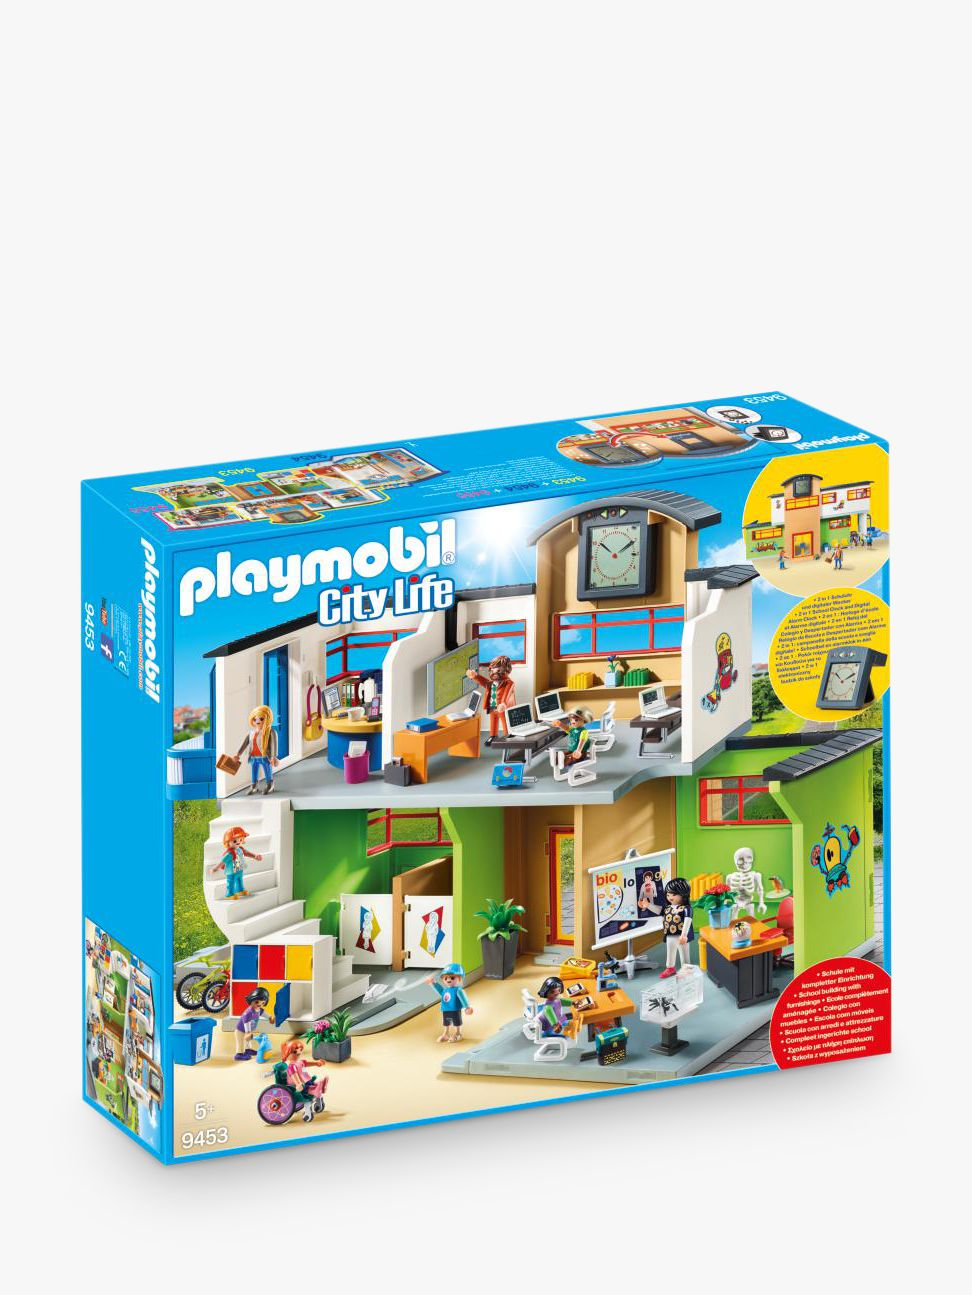 PLAYMOBIL Playmobil City Life 9453 School Building